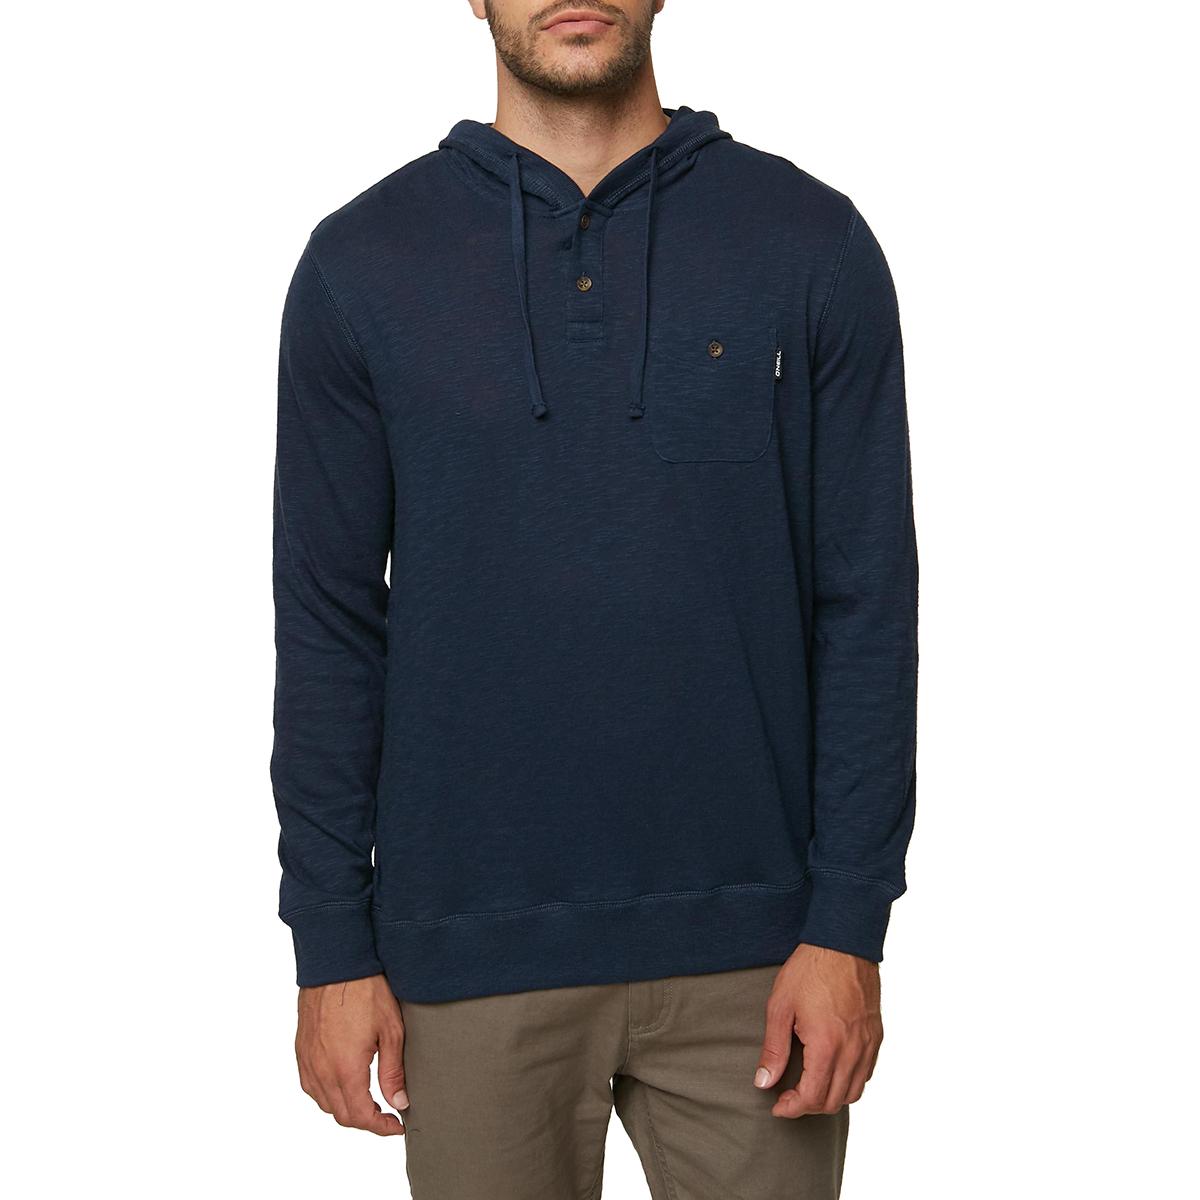 O'neill Guys' Stinson Henley Pullover Hoodie - Blue, M